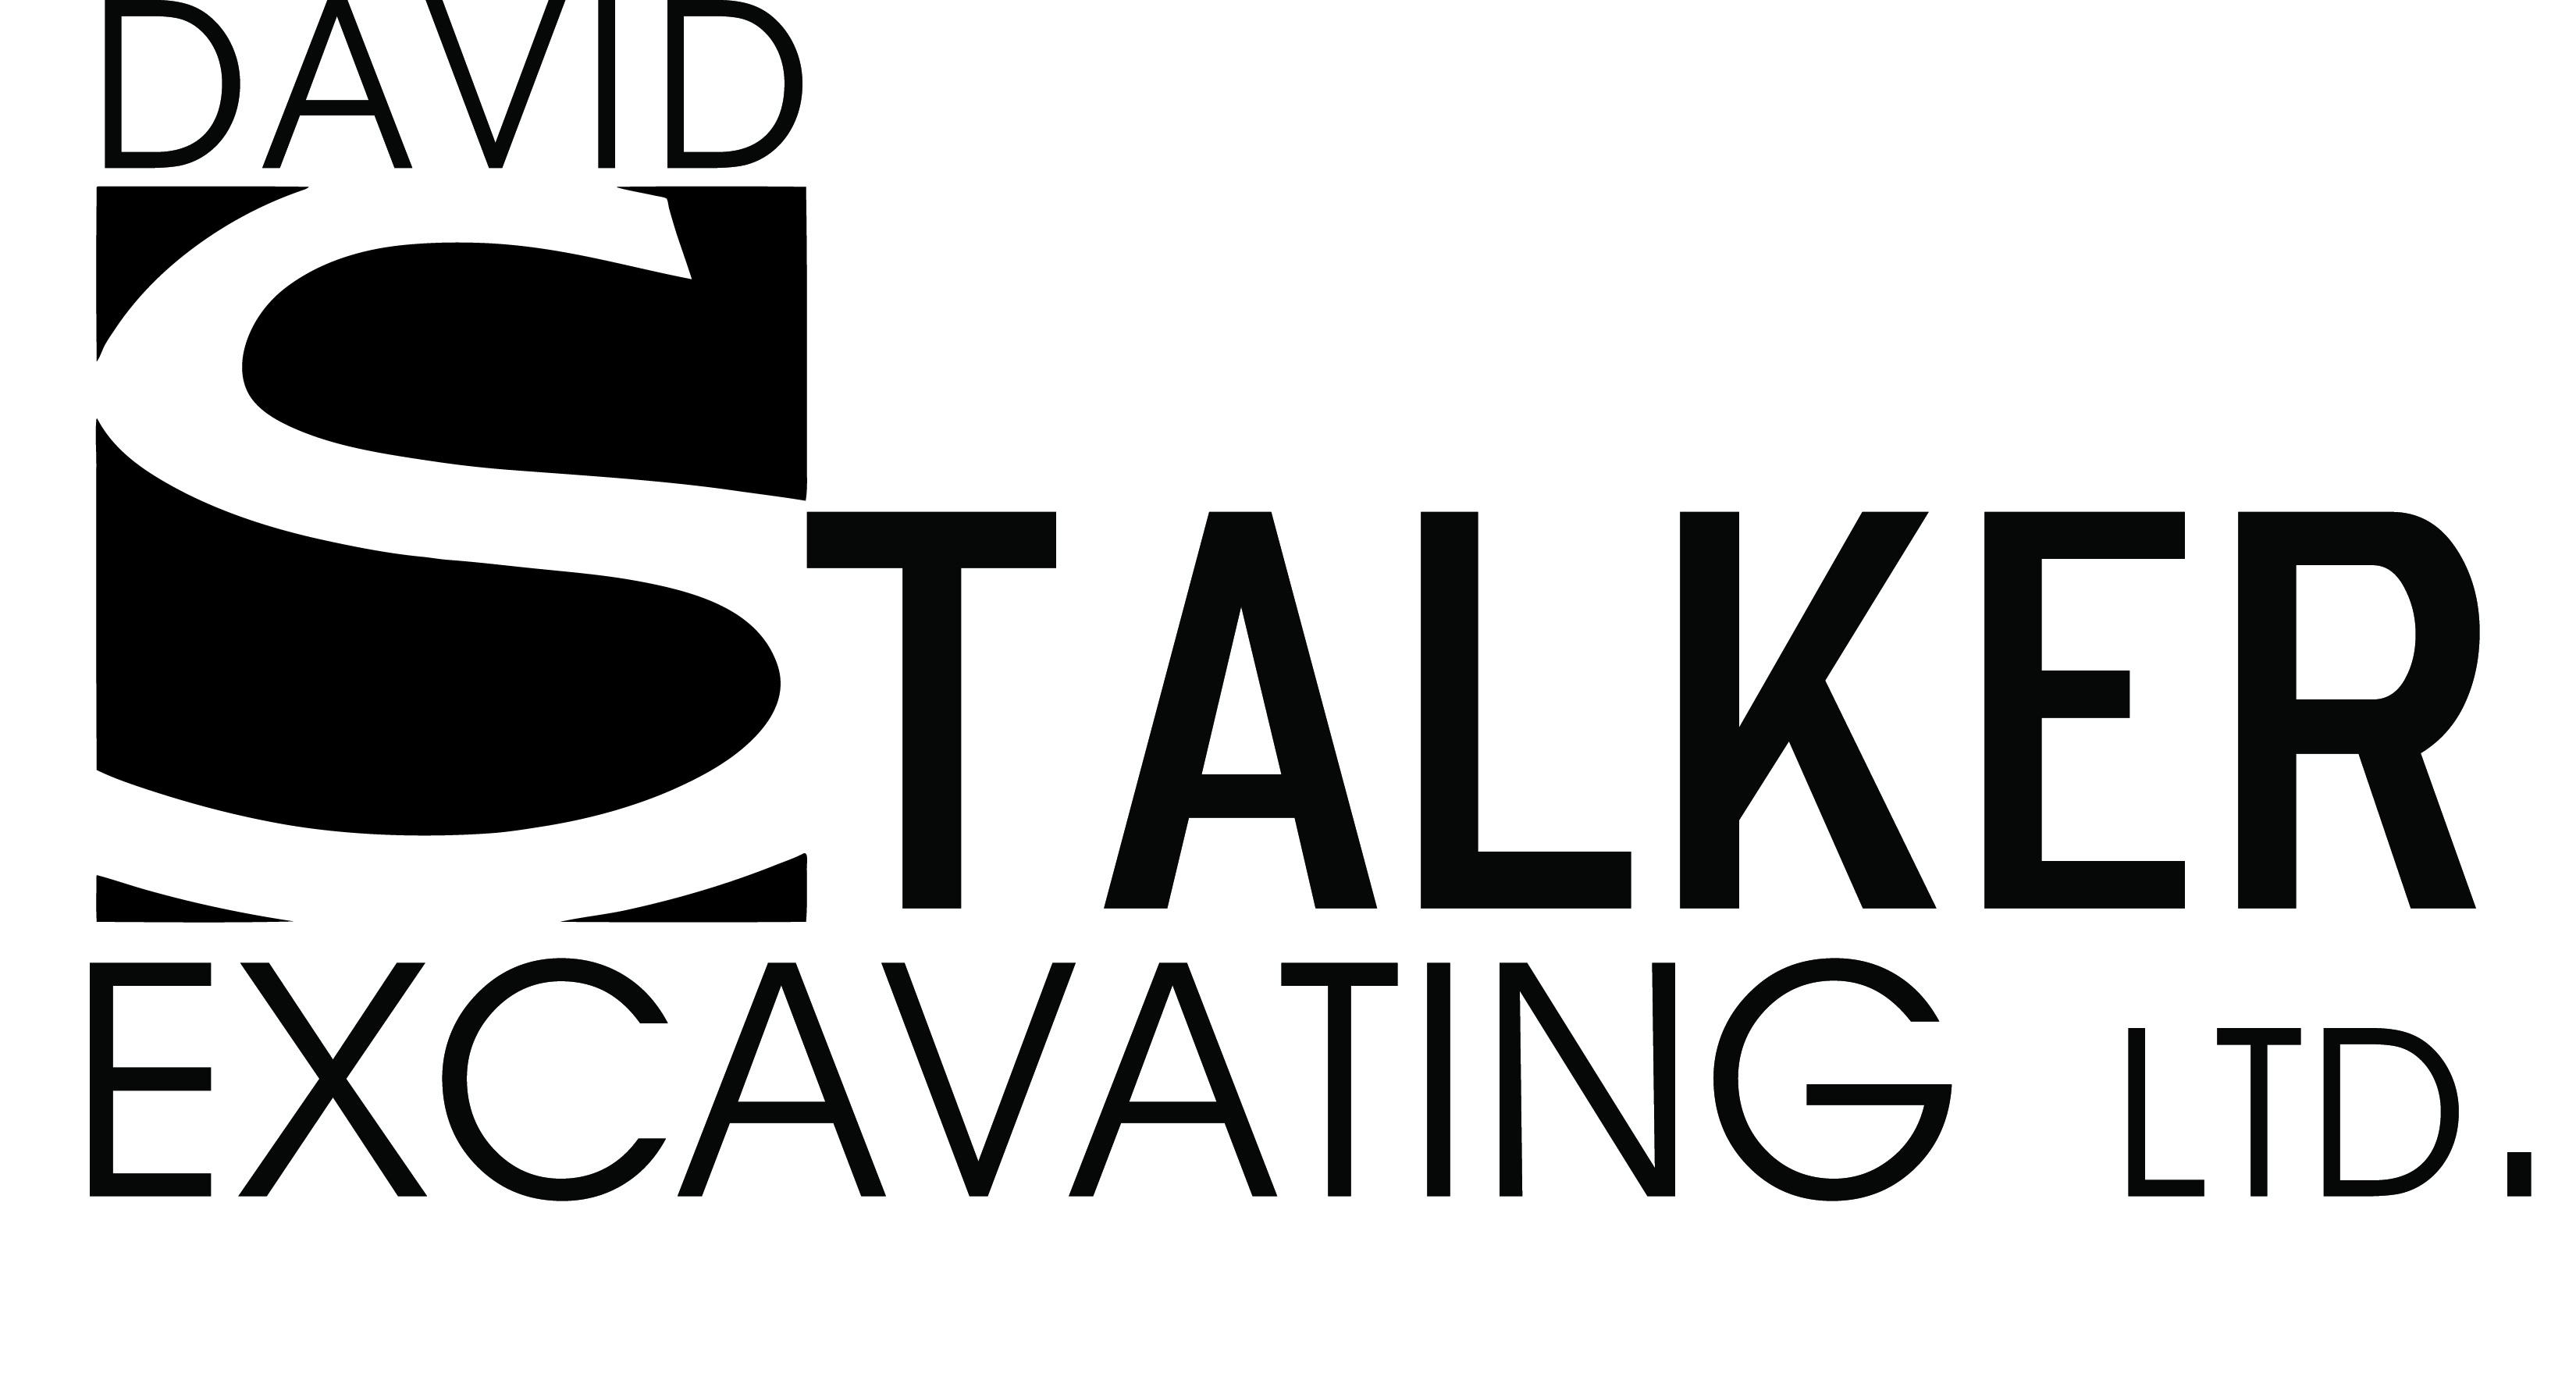 David Stalker Excavation